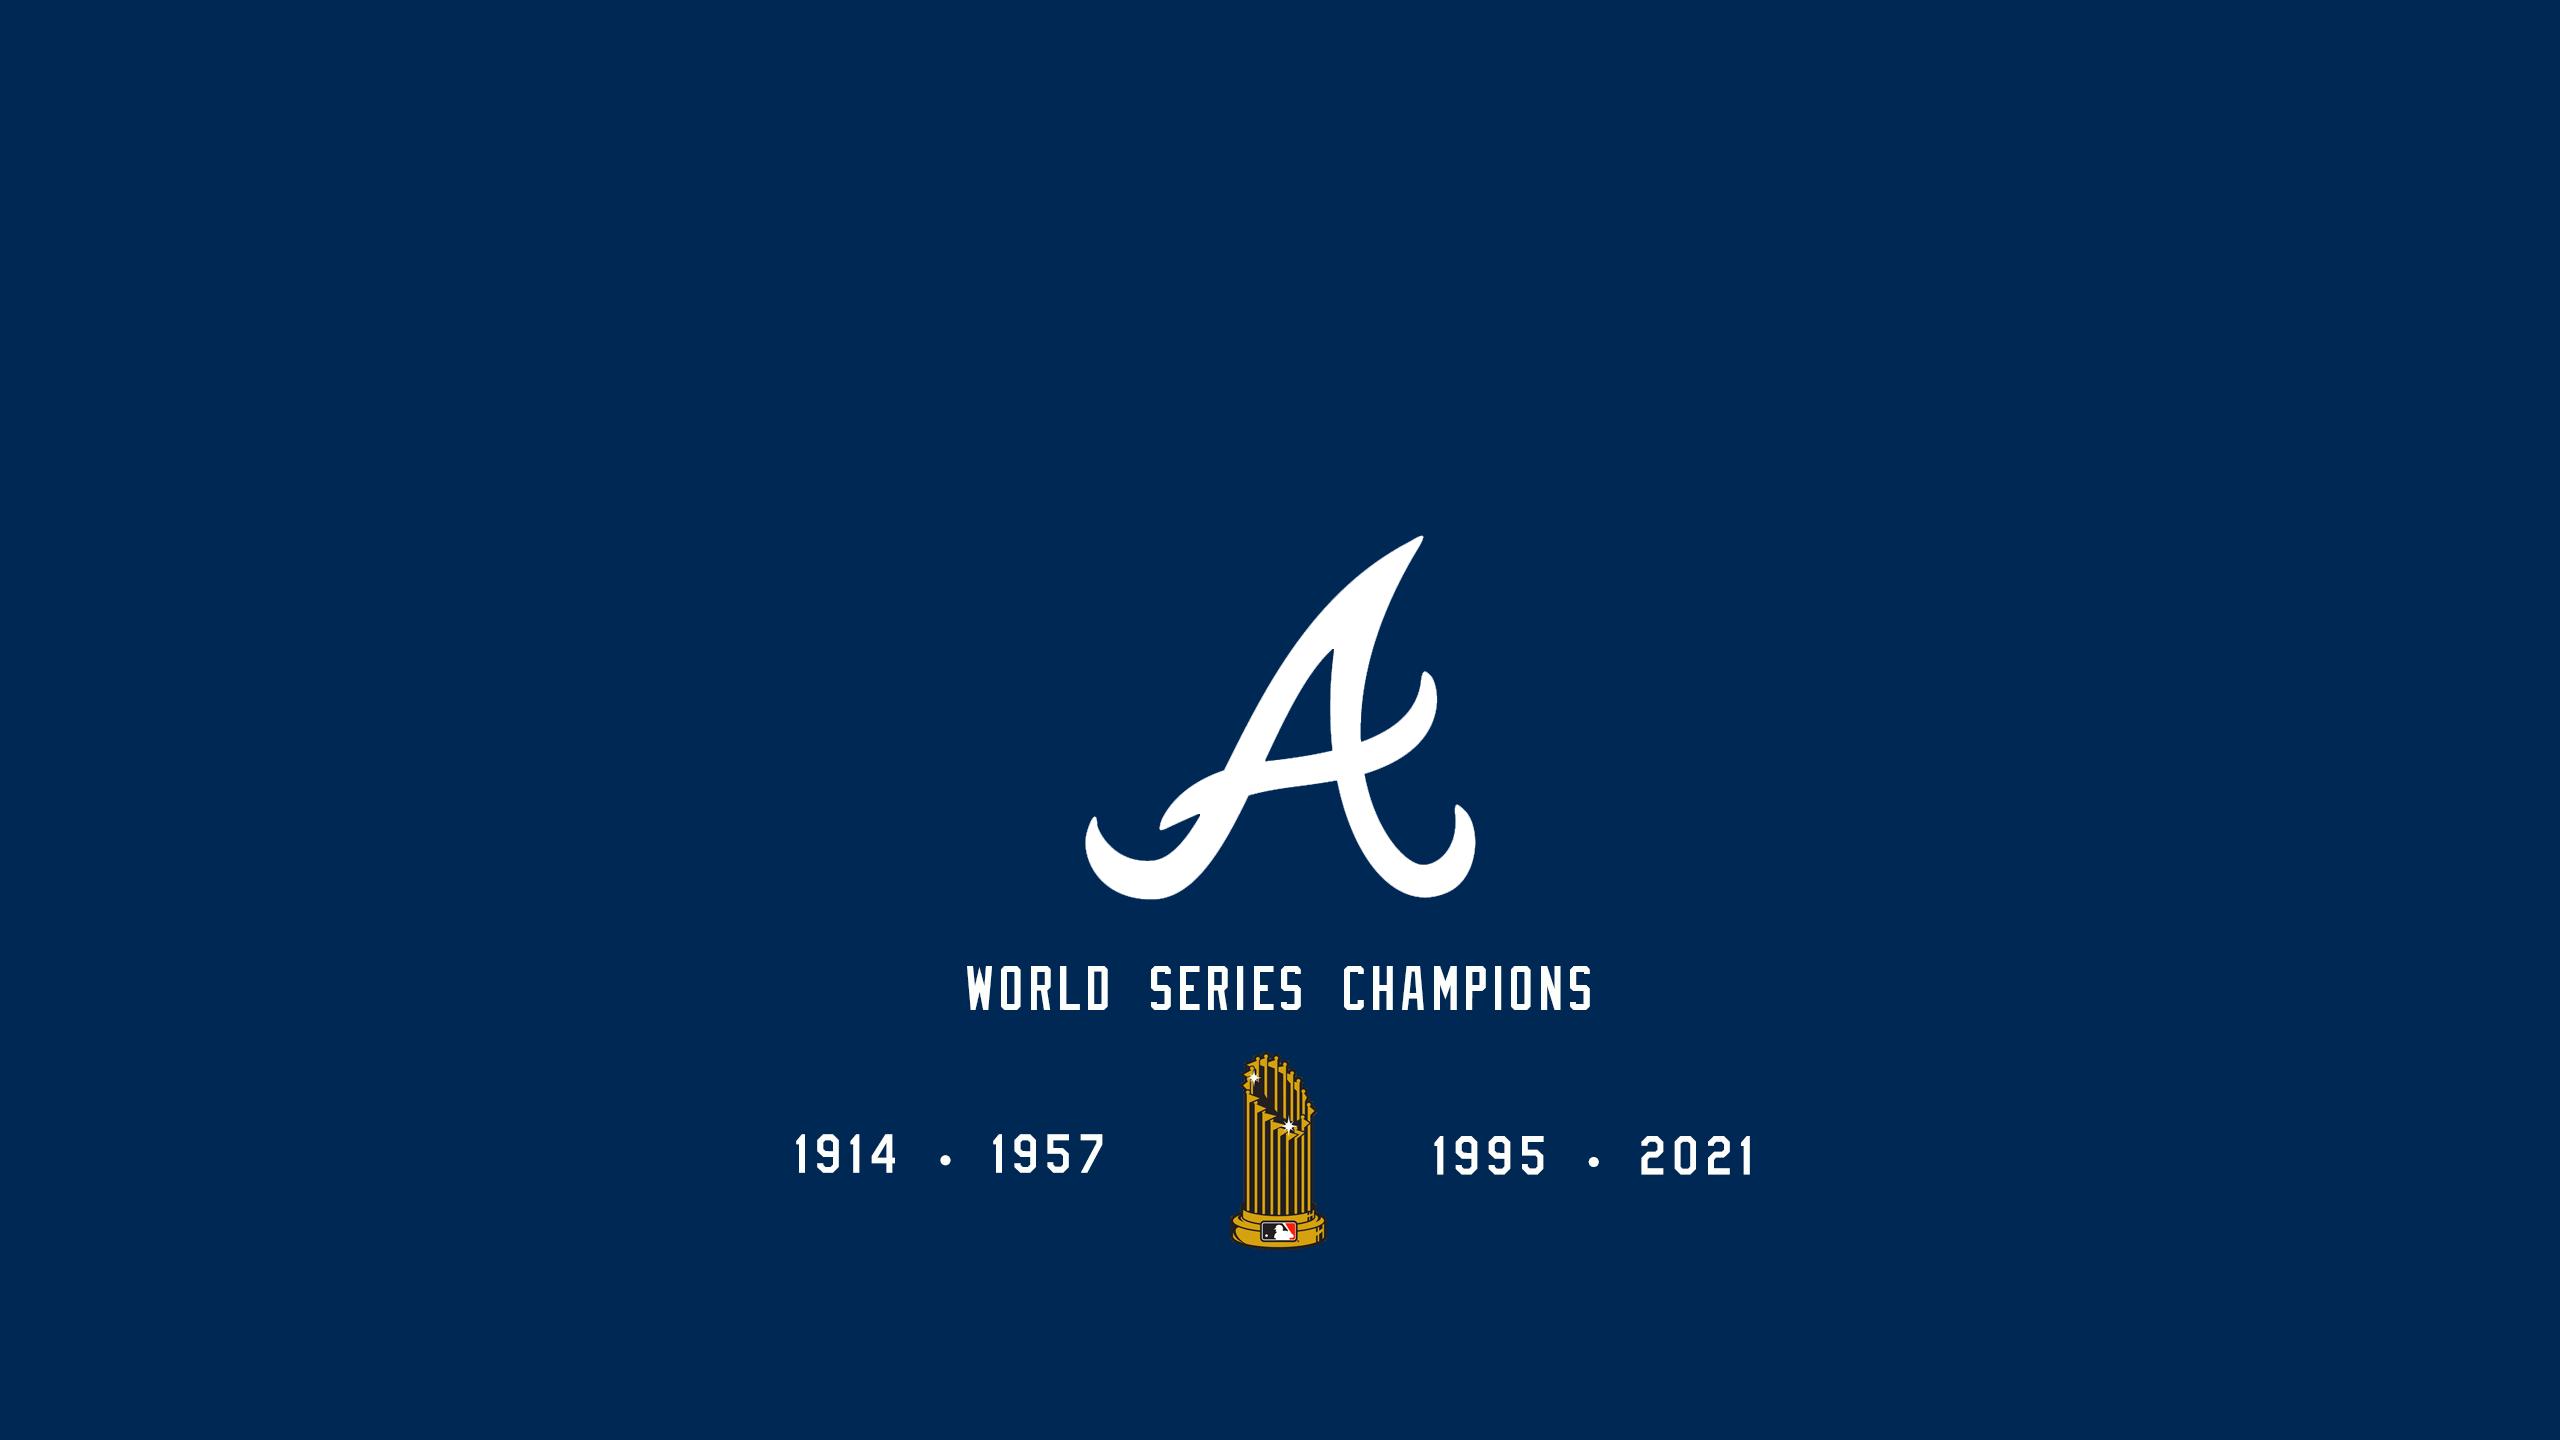 Atlanta Braves - World Series Champs